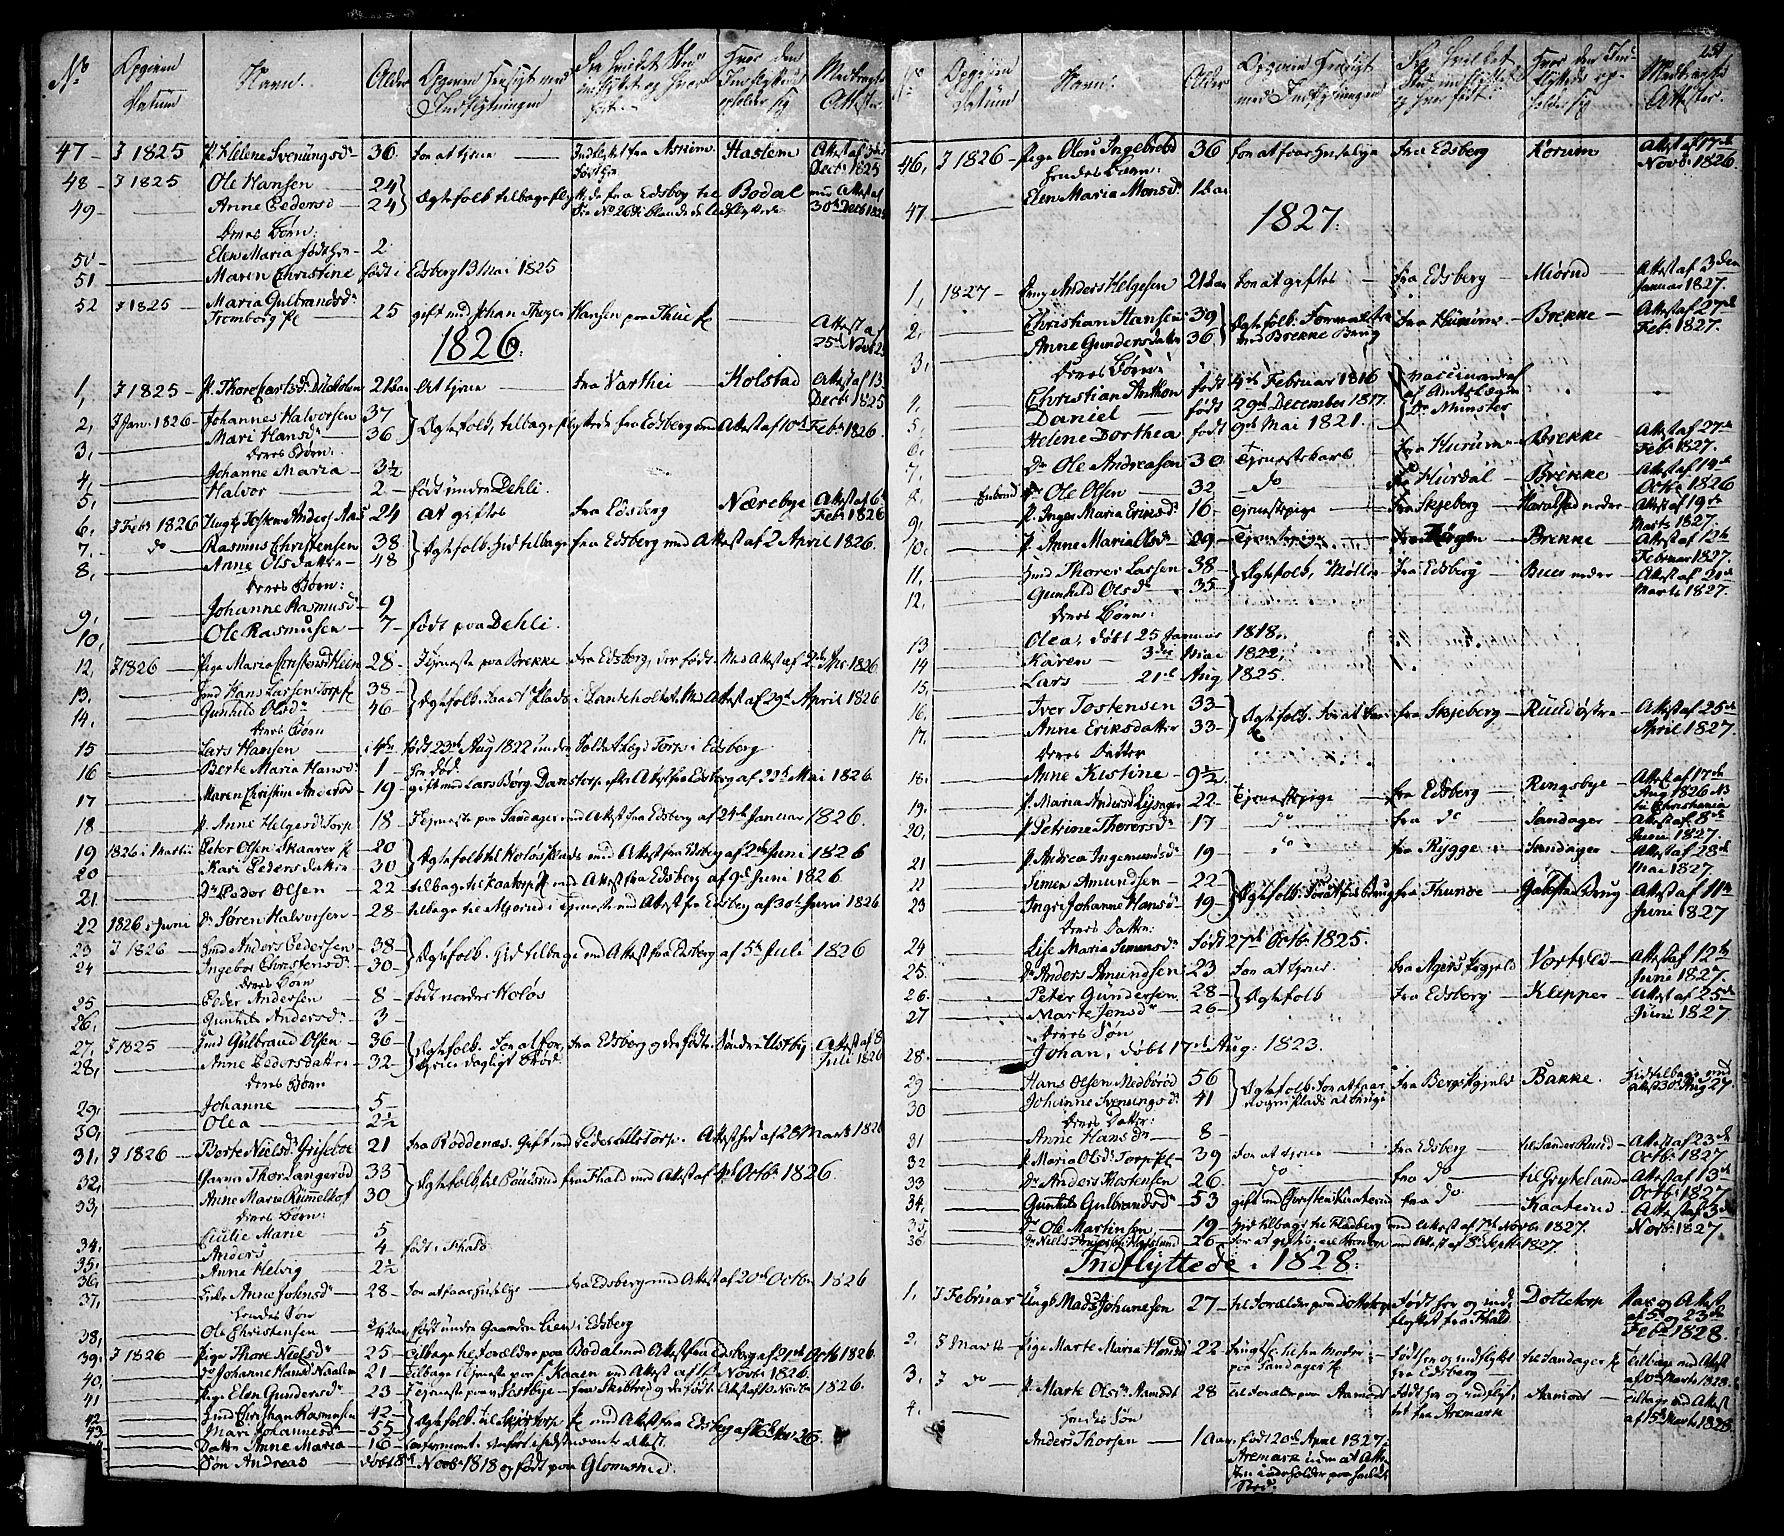 SAO, Rakkestad prestekontor Kirkebøker, F/Fa/L0007: Ministerialbok nr. I 7, 1825-1841, s. 251